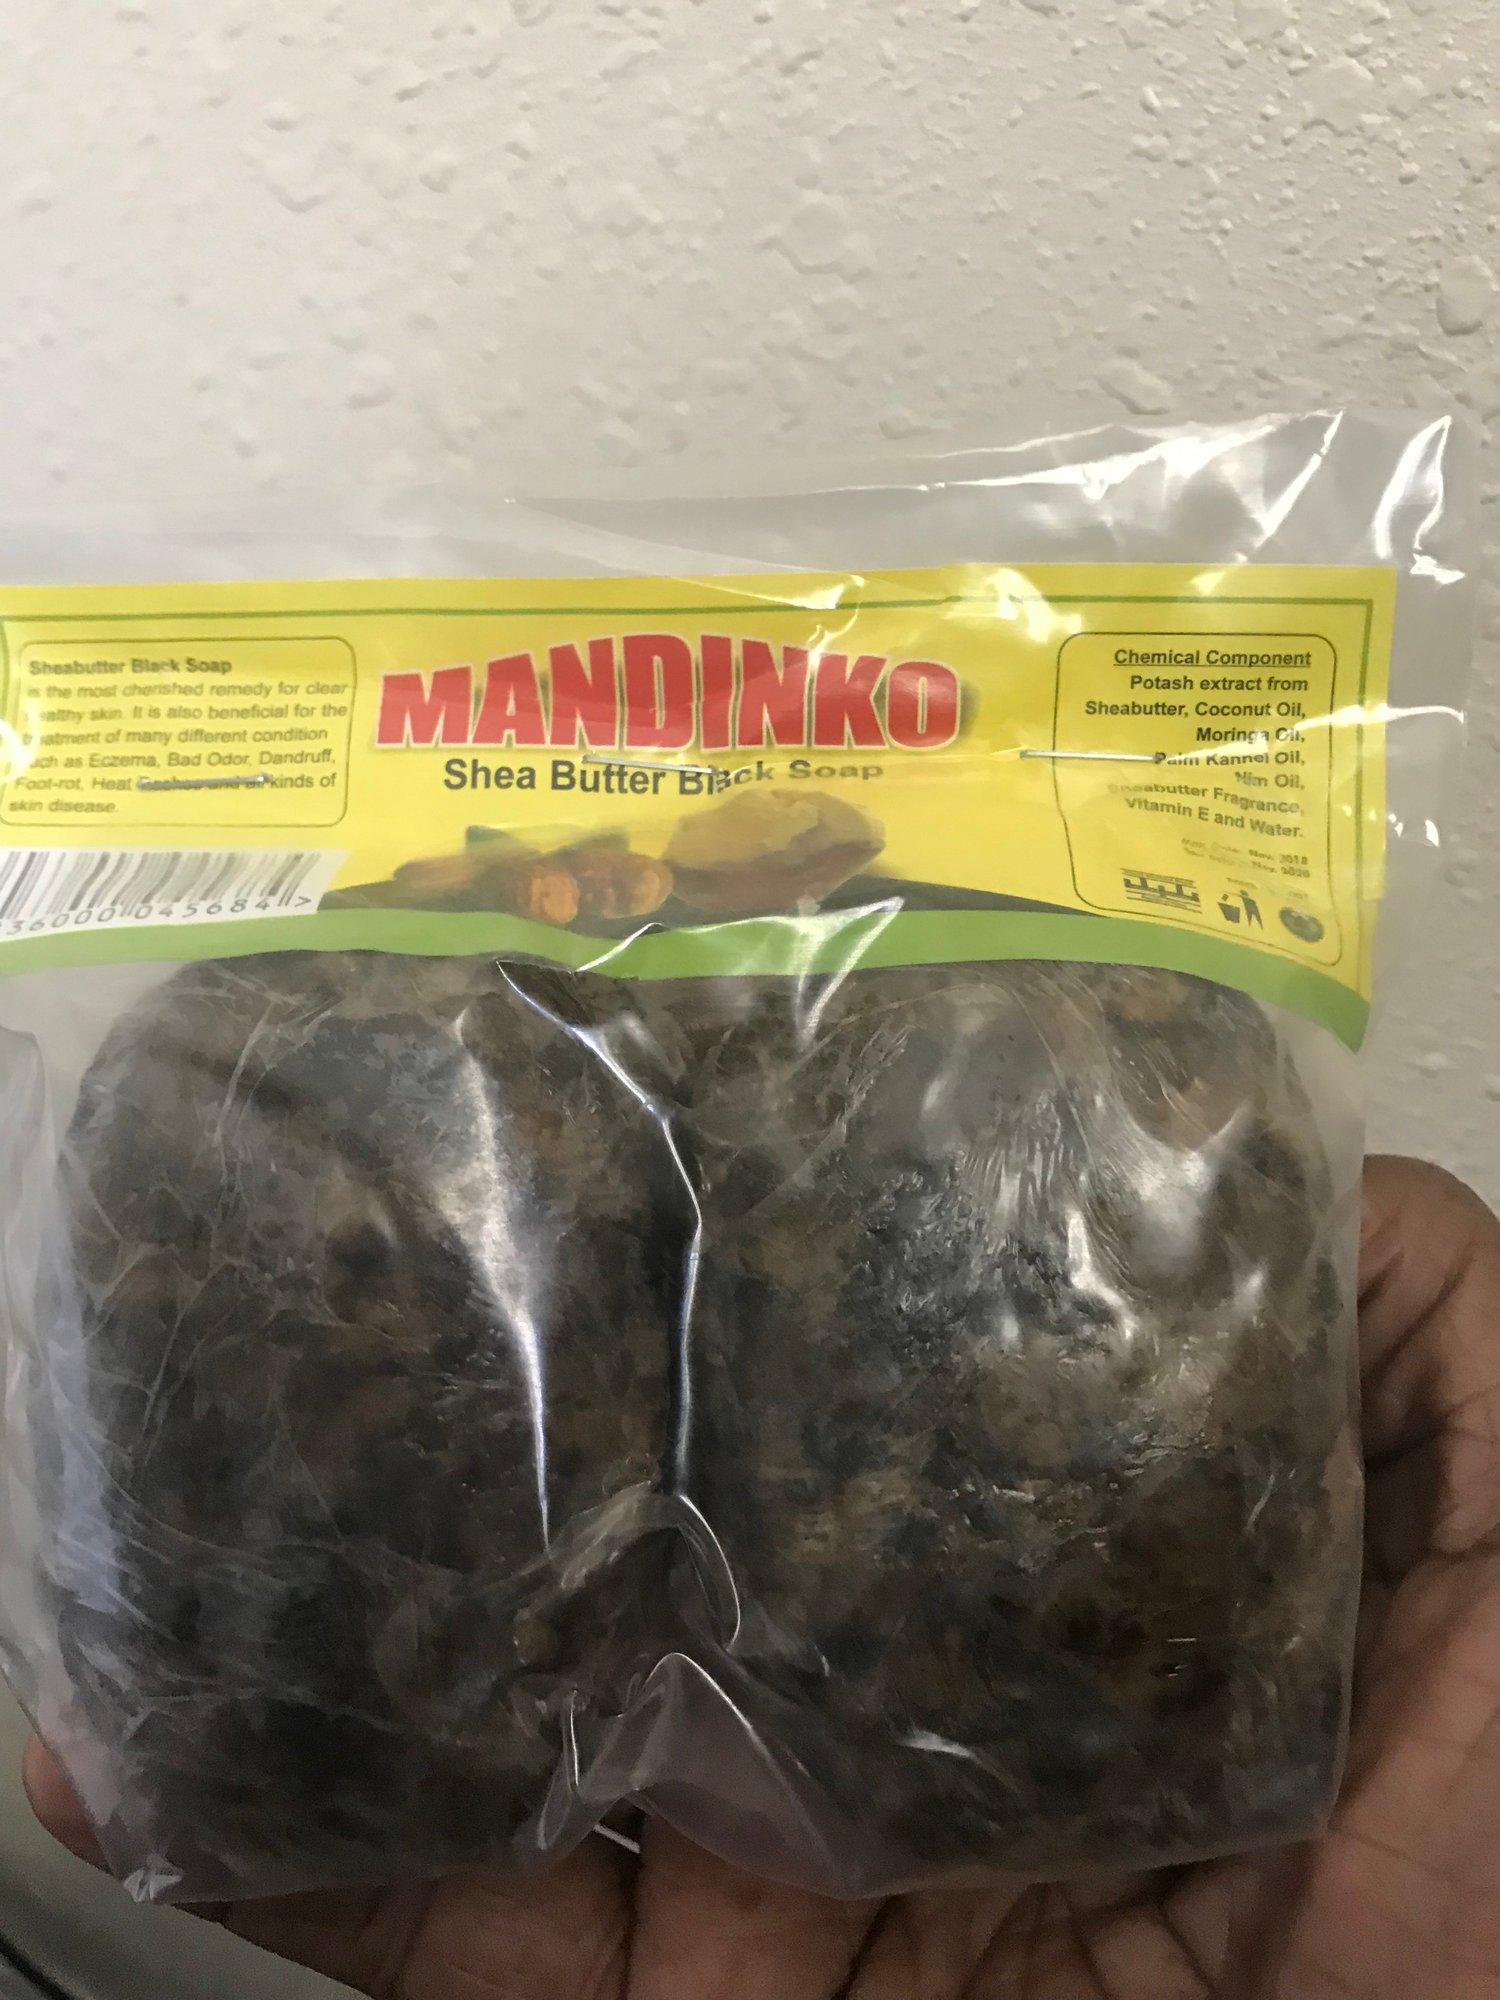 Image of Mandinko Shea Butter Black Soap